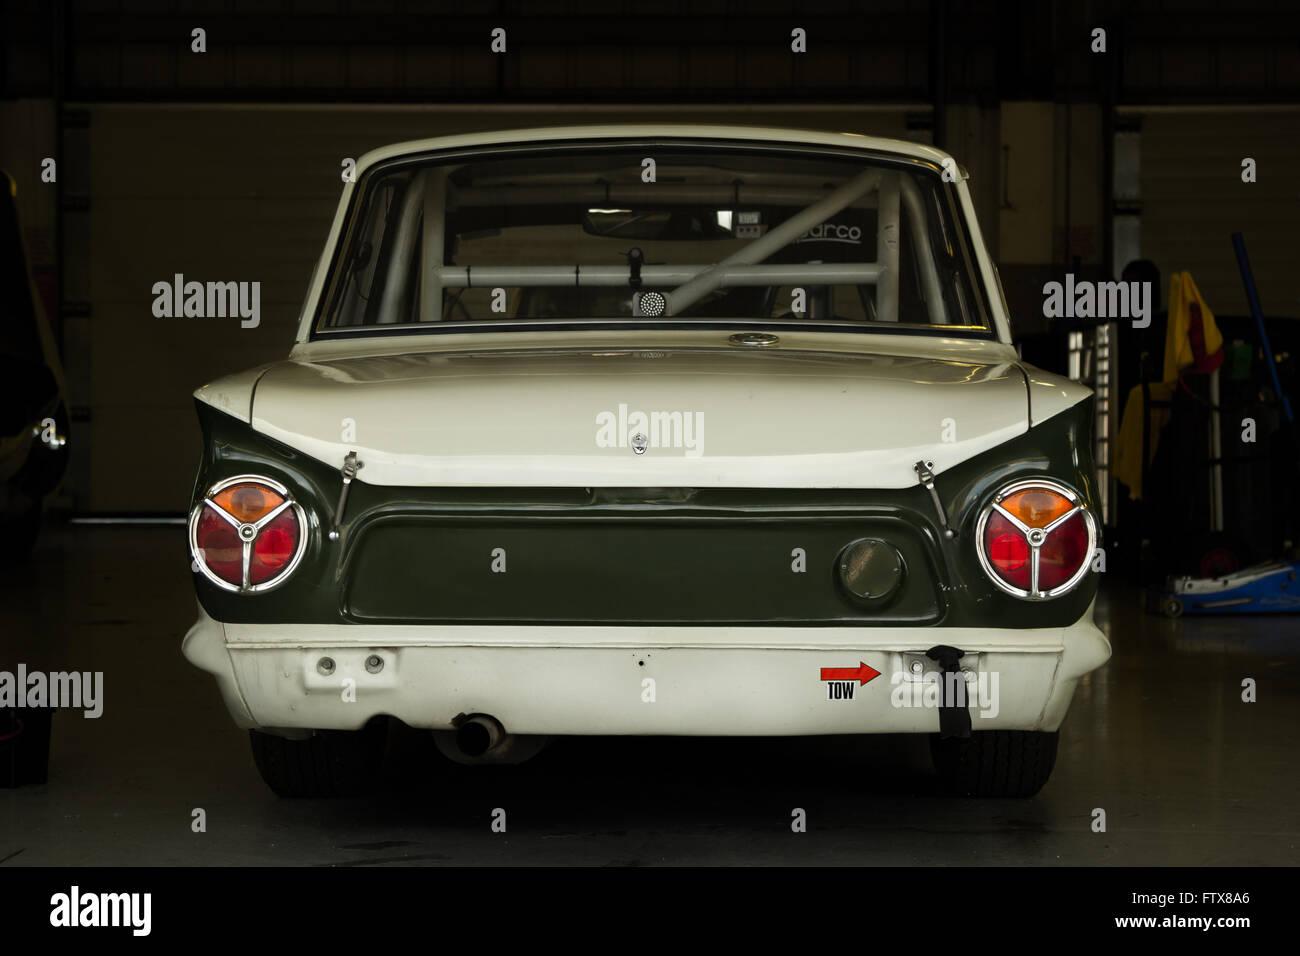 Ford Cortina Lotus British Touring Car Stock Photo